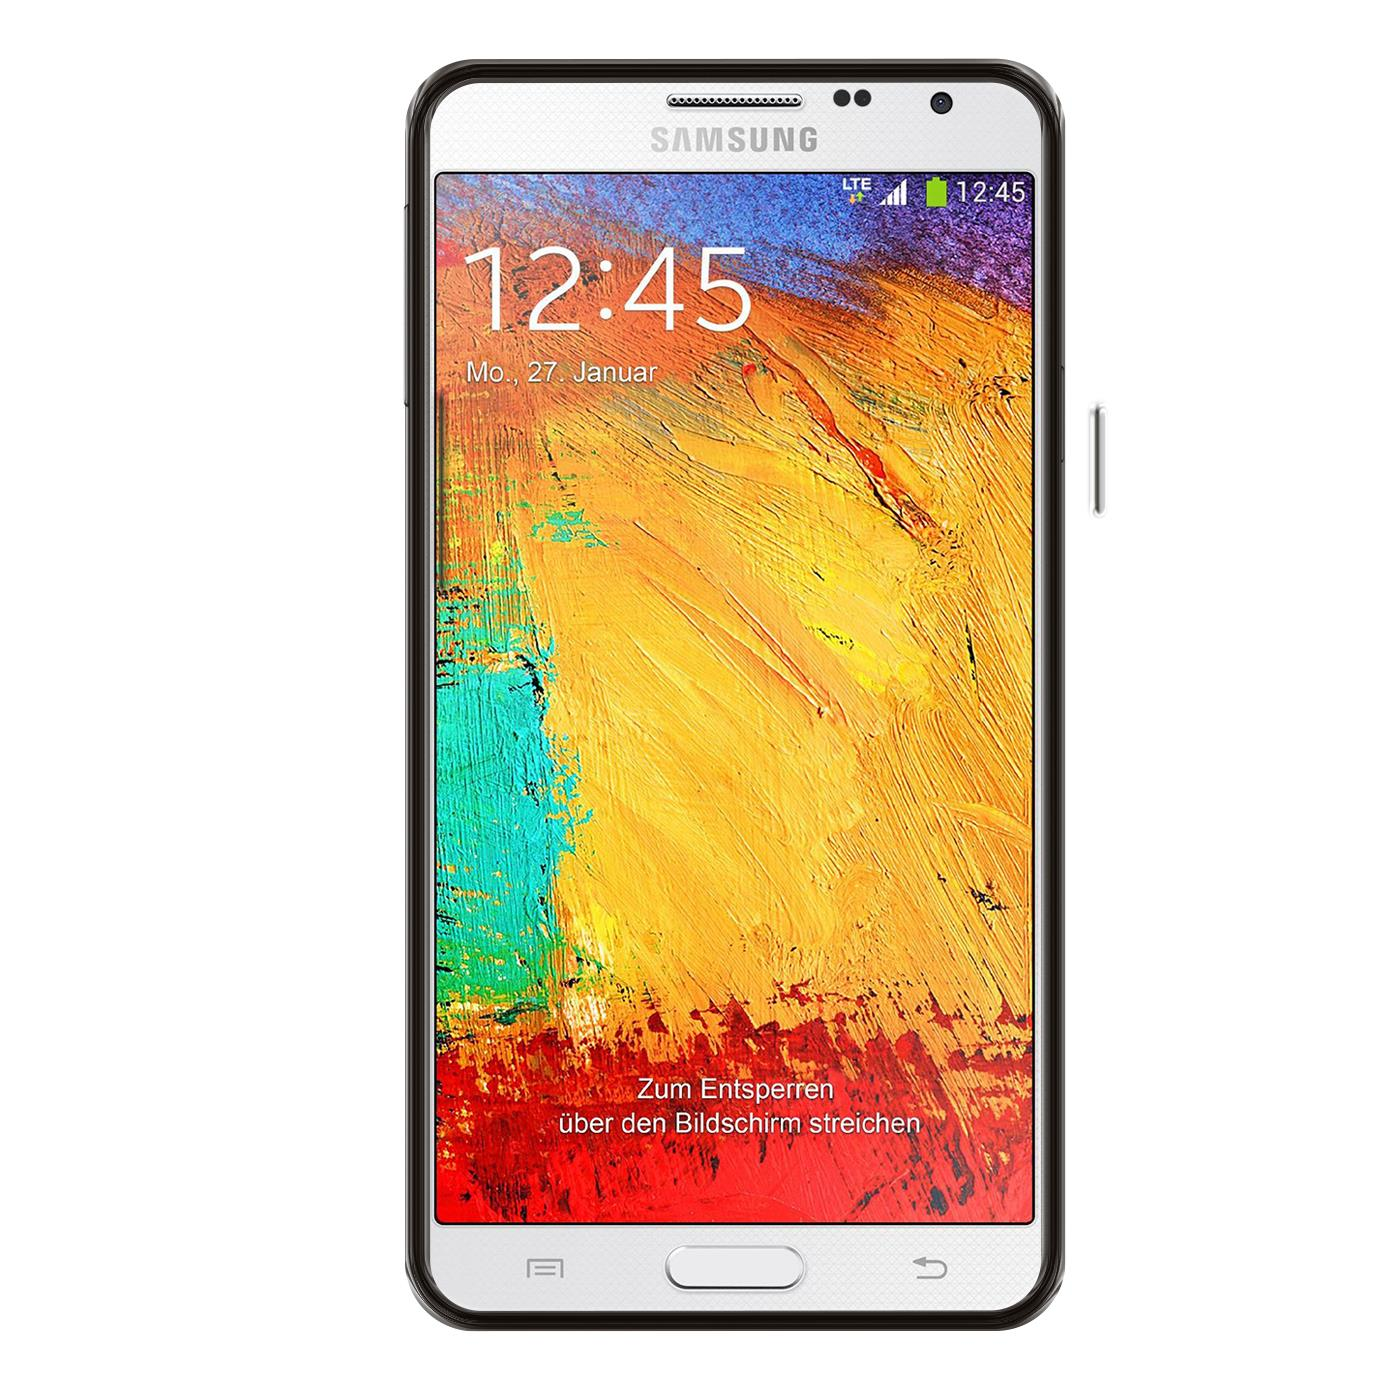 Samsung-Galaxy-Note-4-Thin-Silikon-Klar-Case-Cover-Ultra-Slim-Stossfeste-Gel Indexbild 29